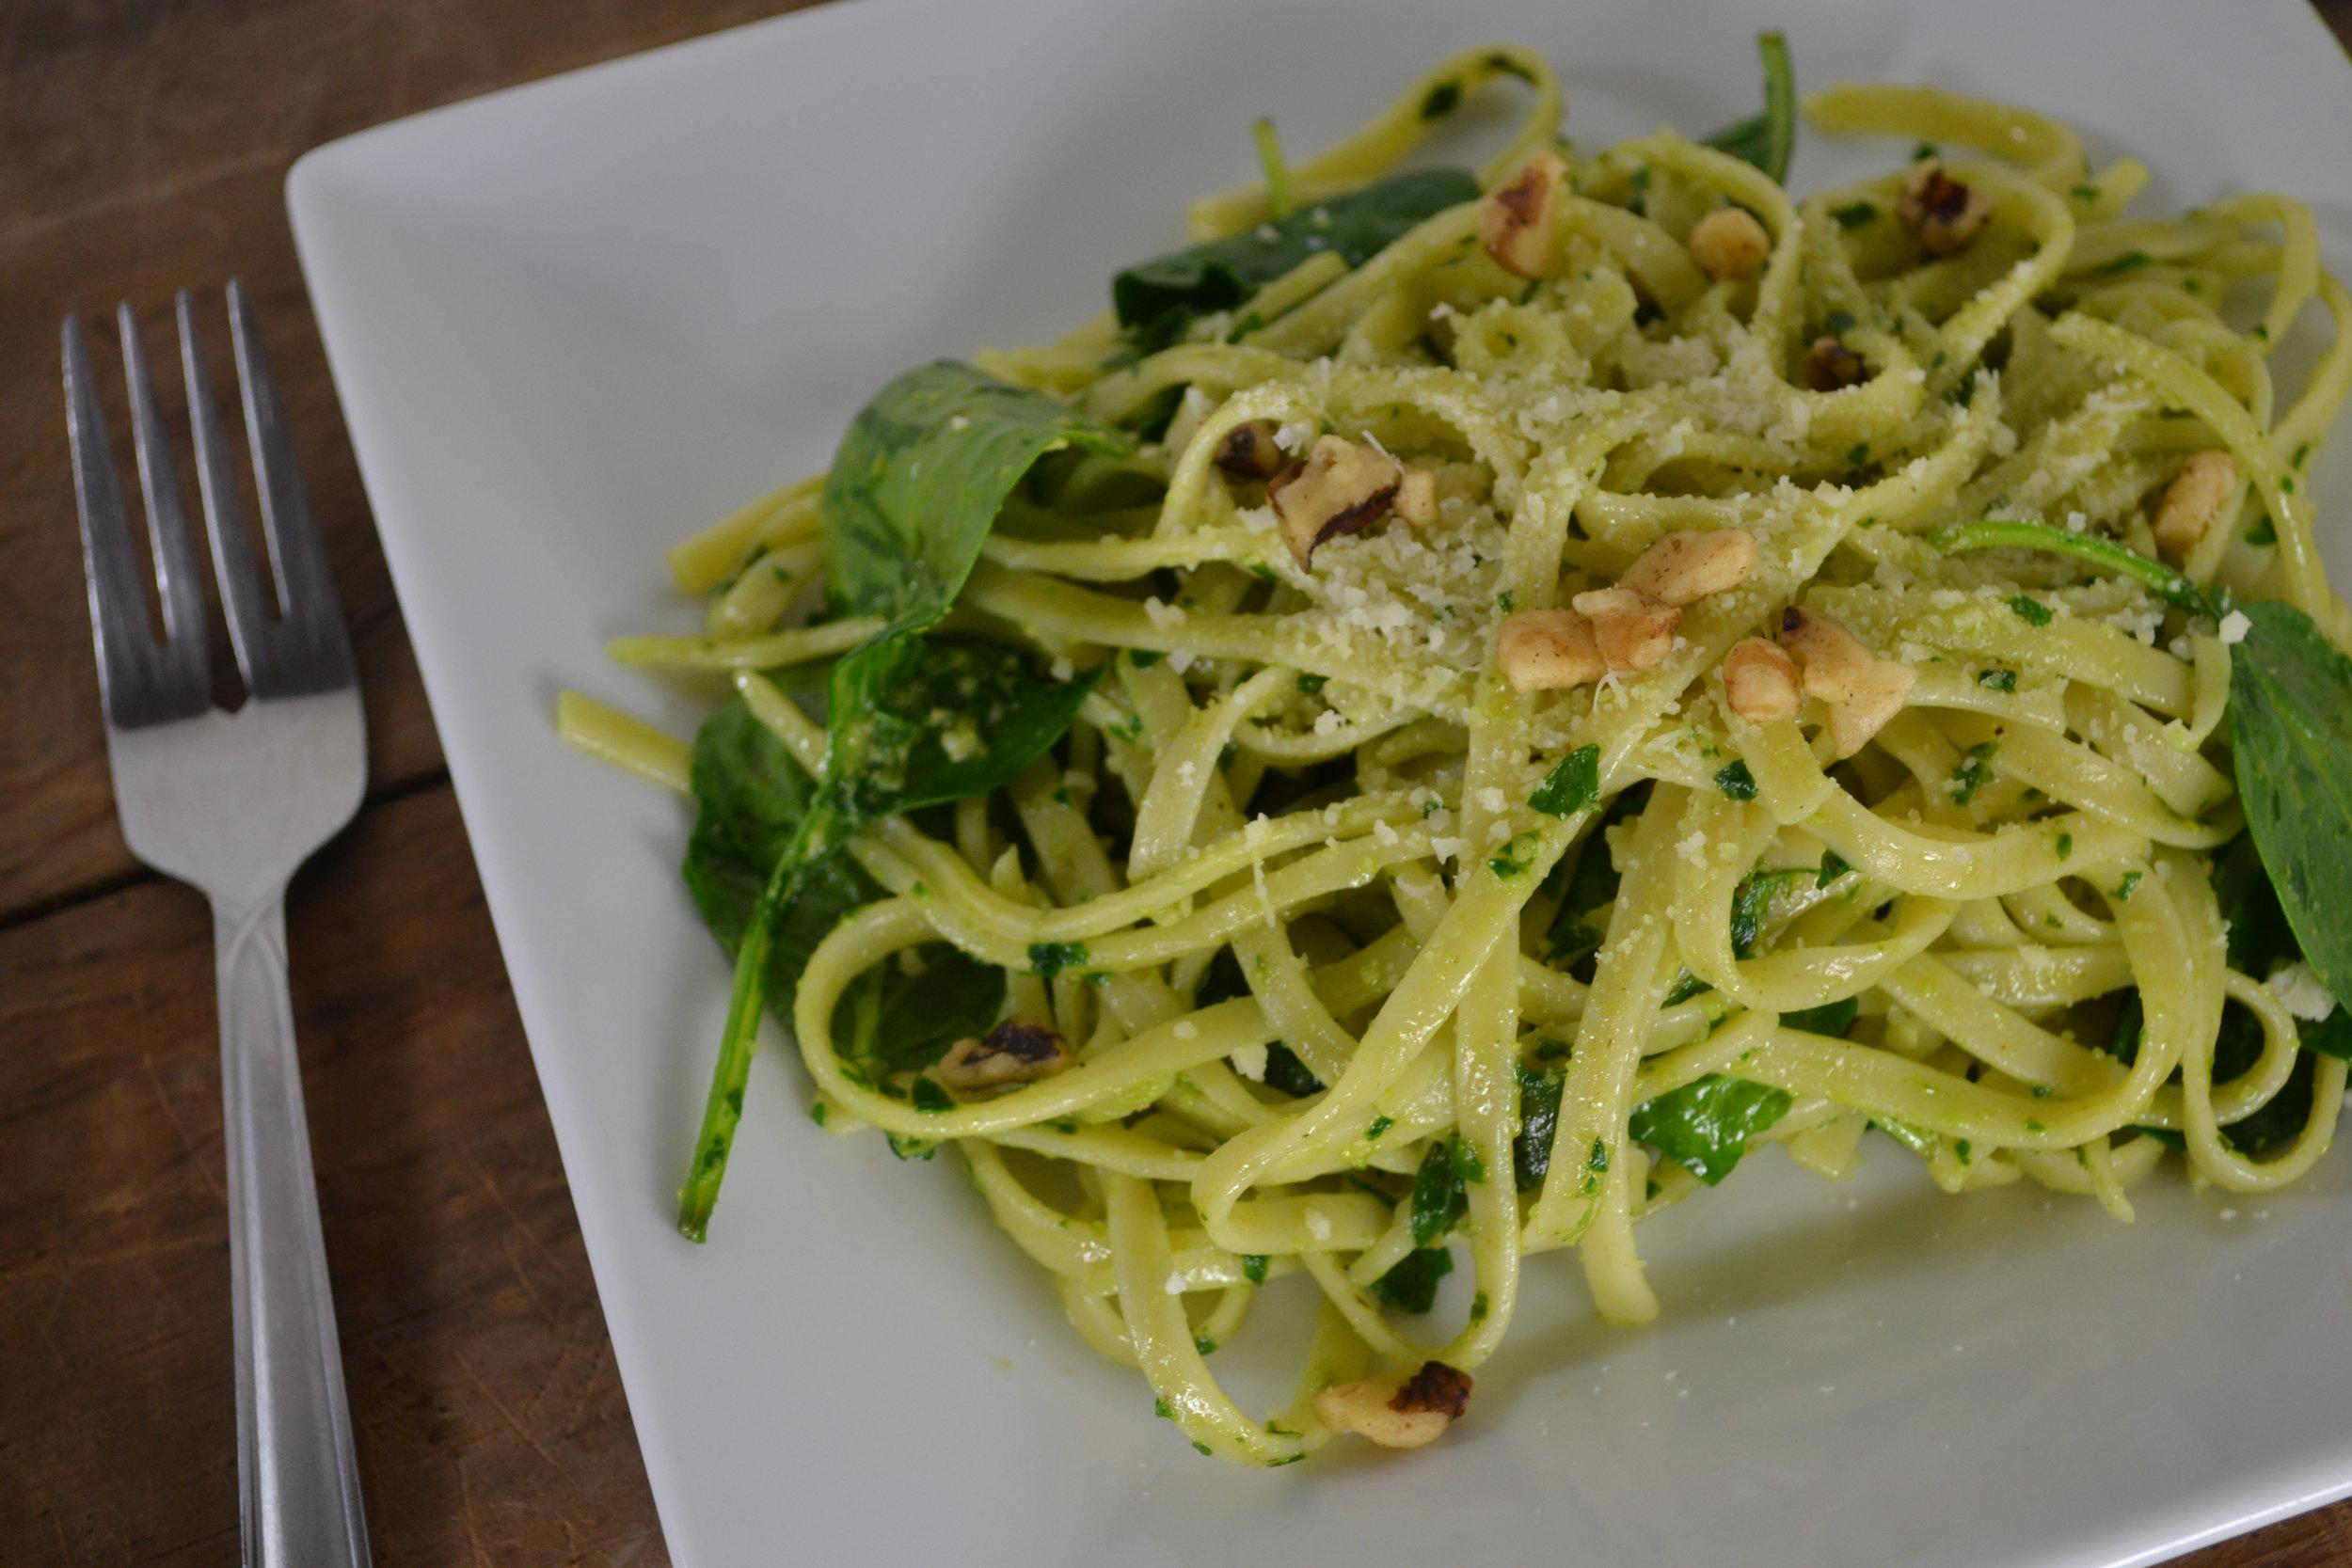 Fettuccine with parsley pesto 1